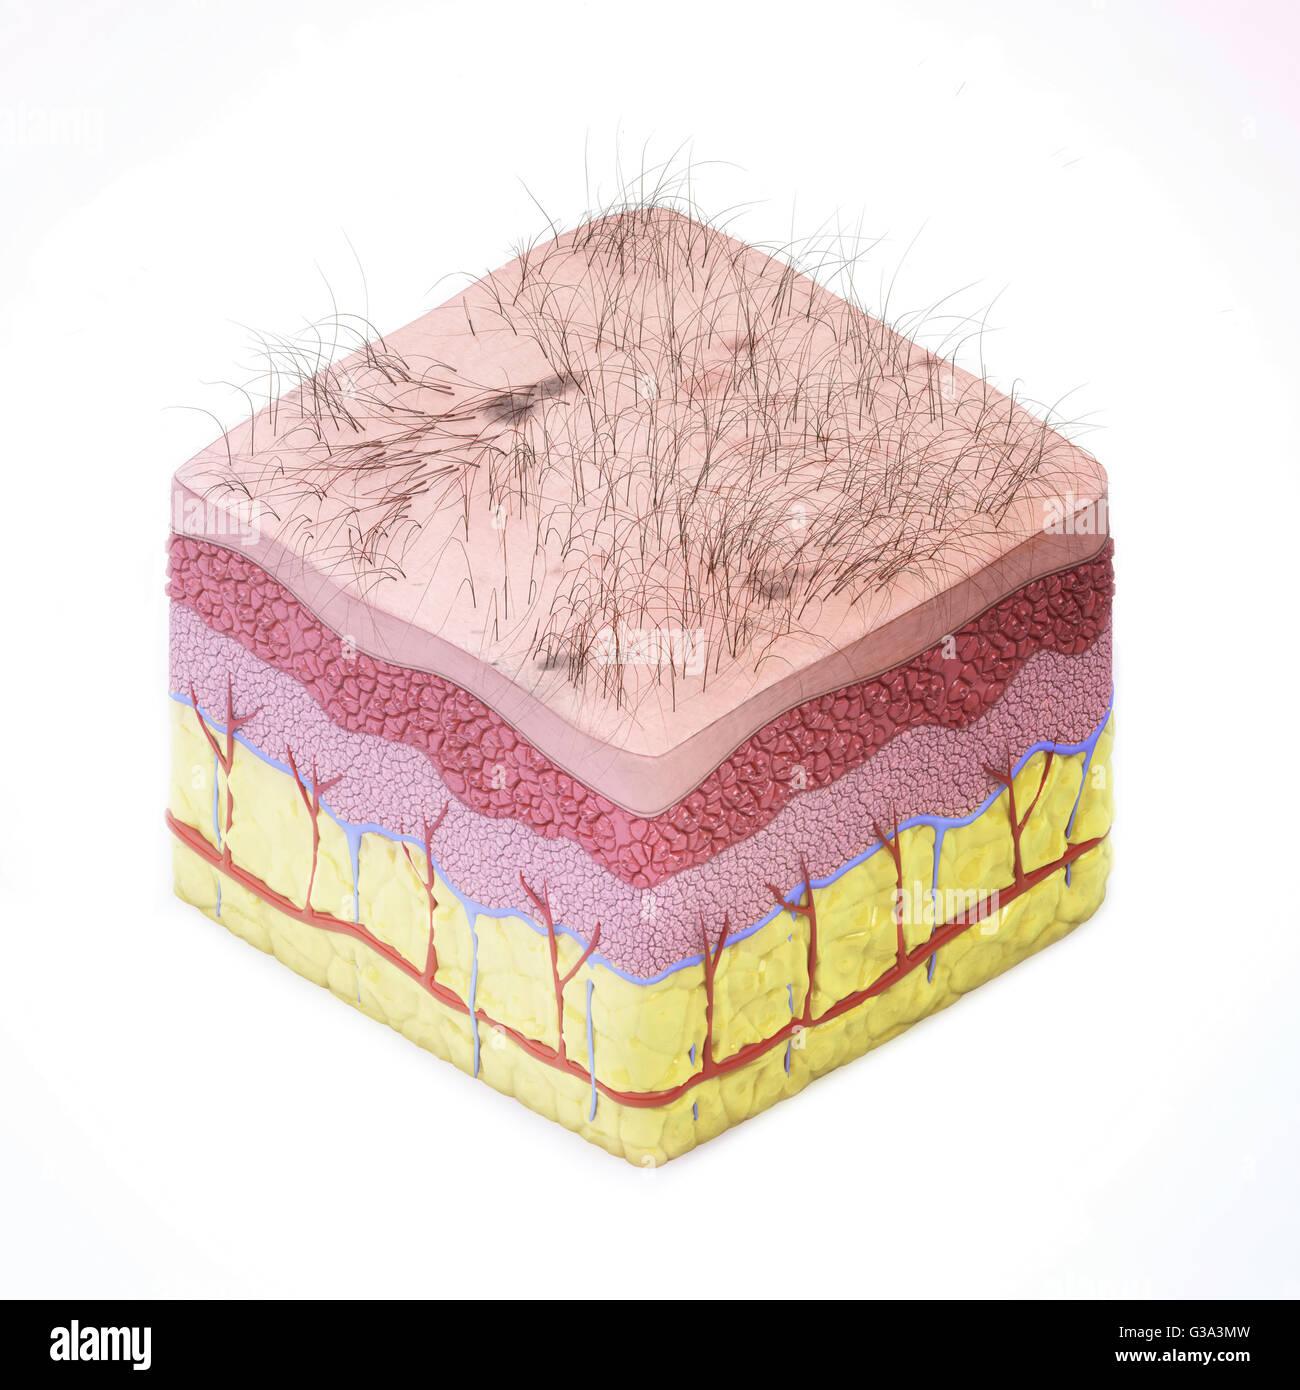 La pelle umana - il rendering 3D Immagini Stock